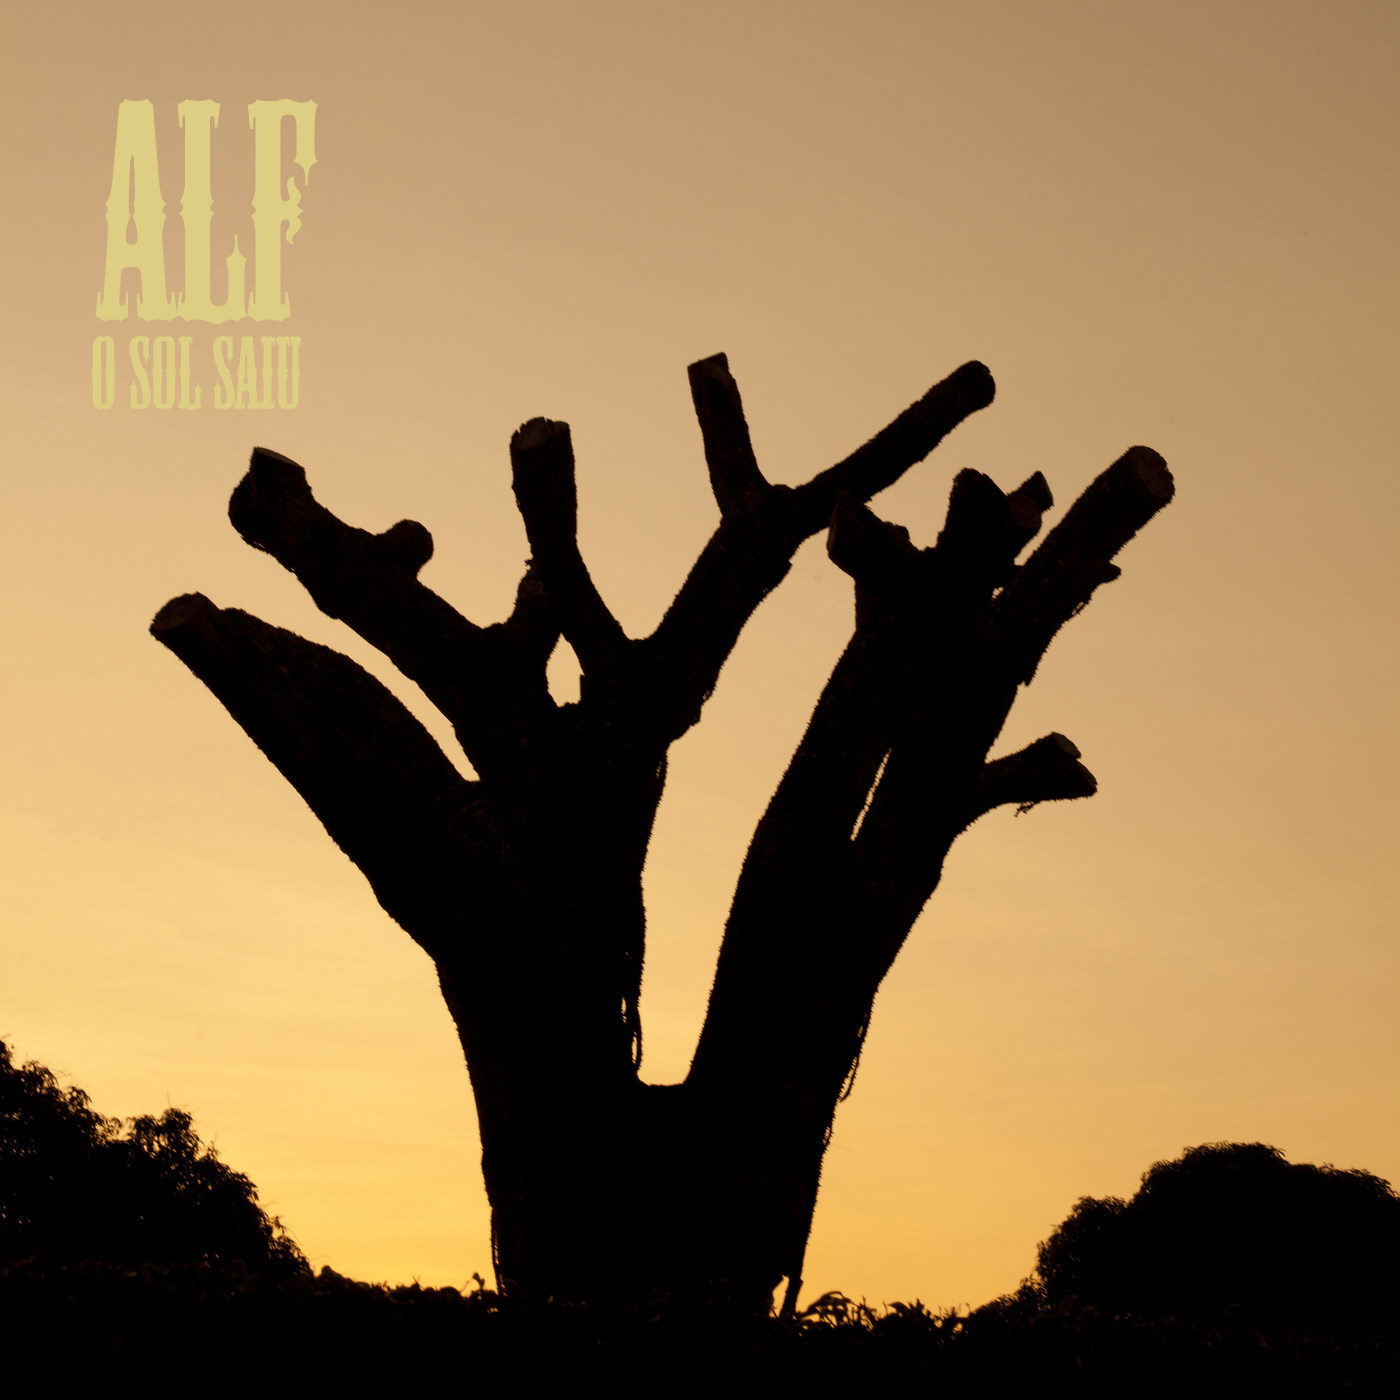 Alf (Rumbora) - O Sol Saiu